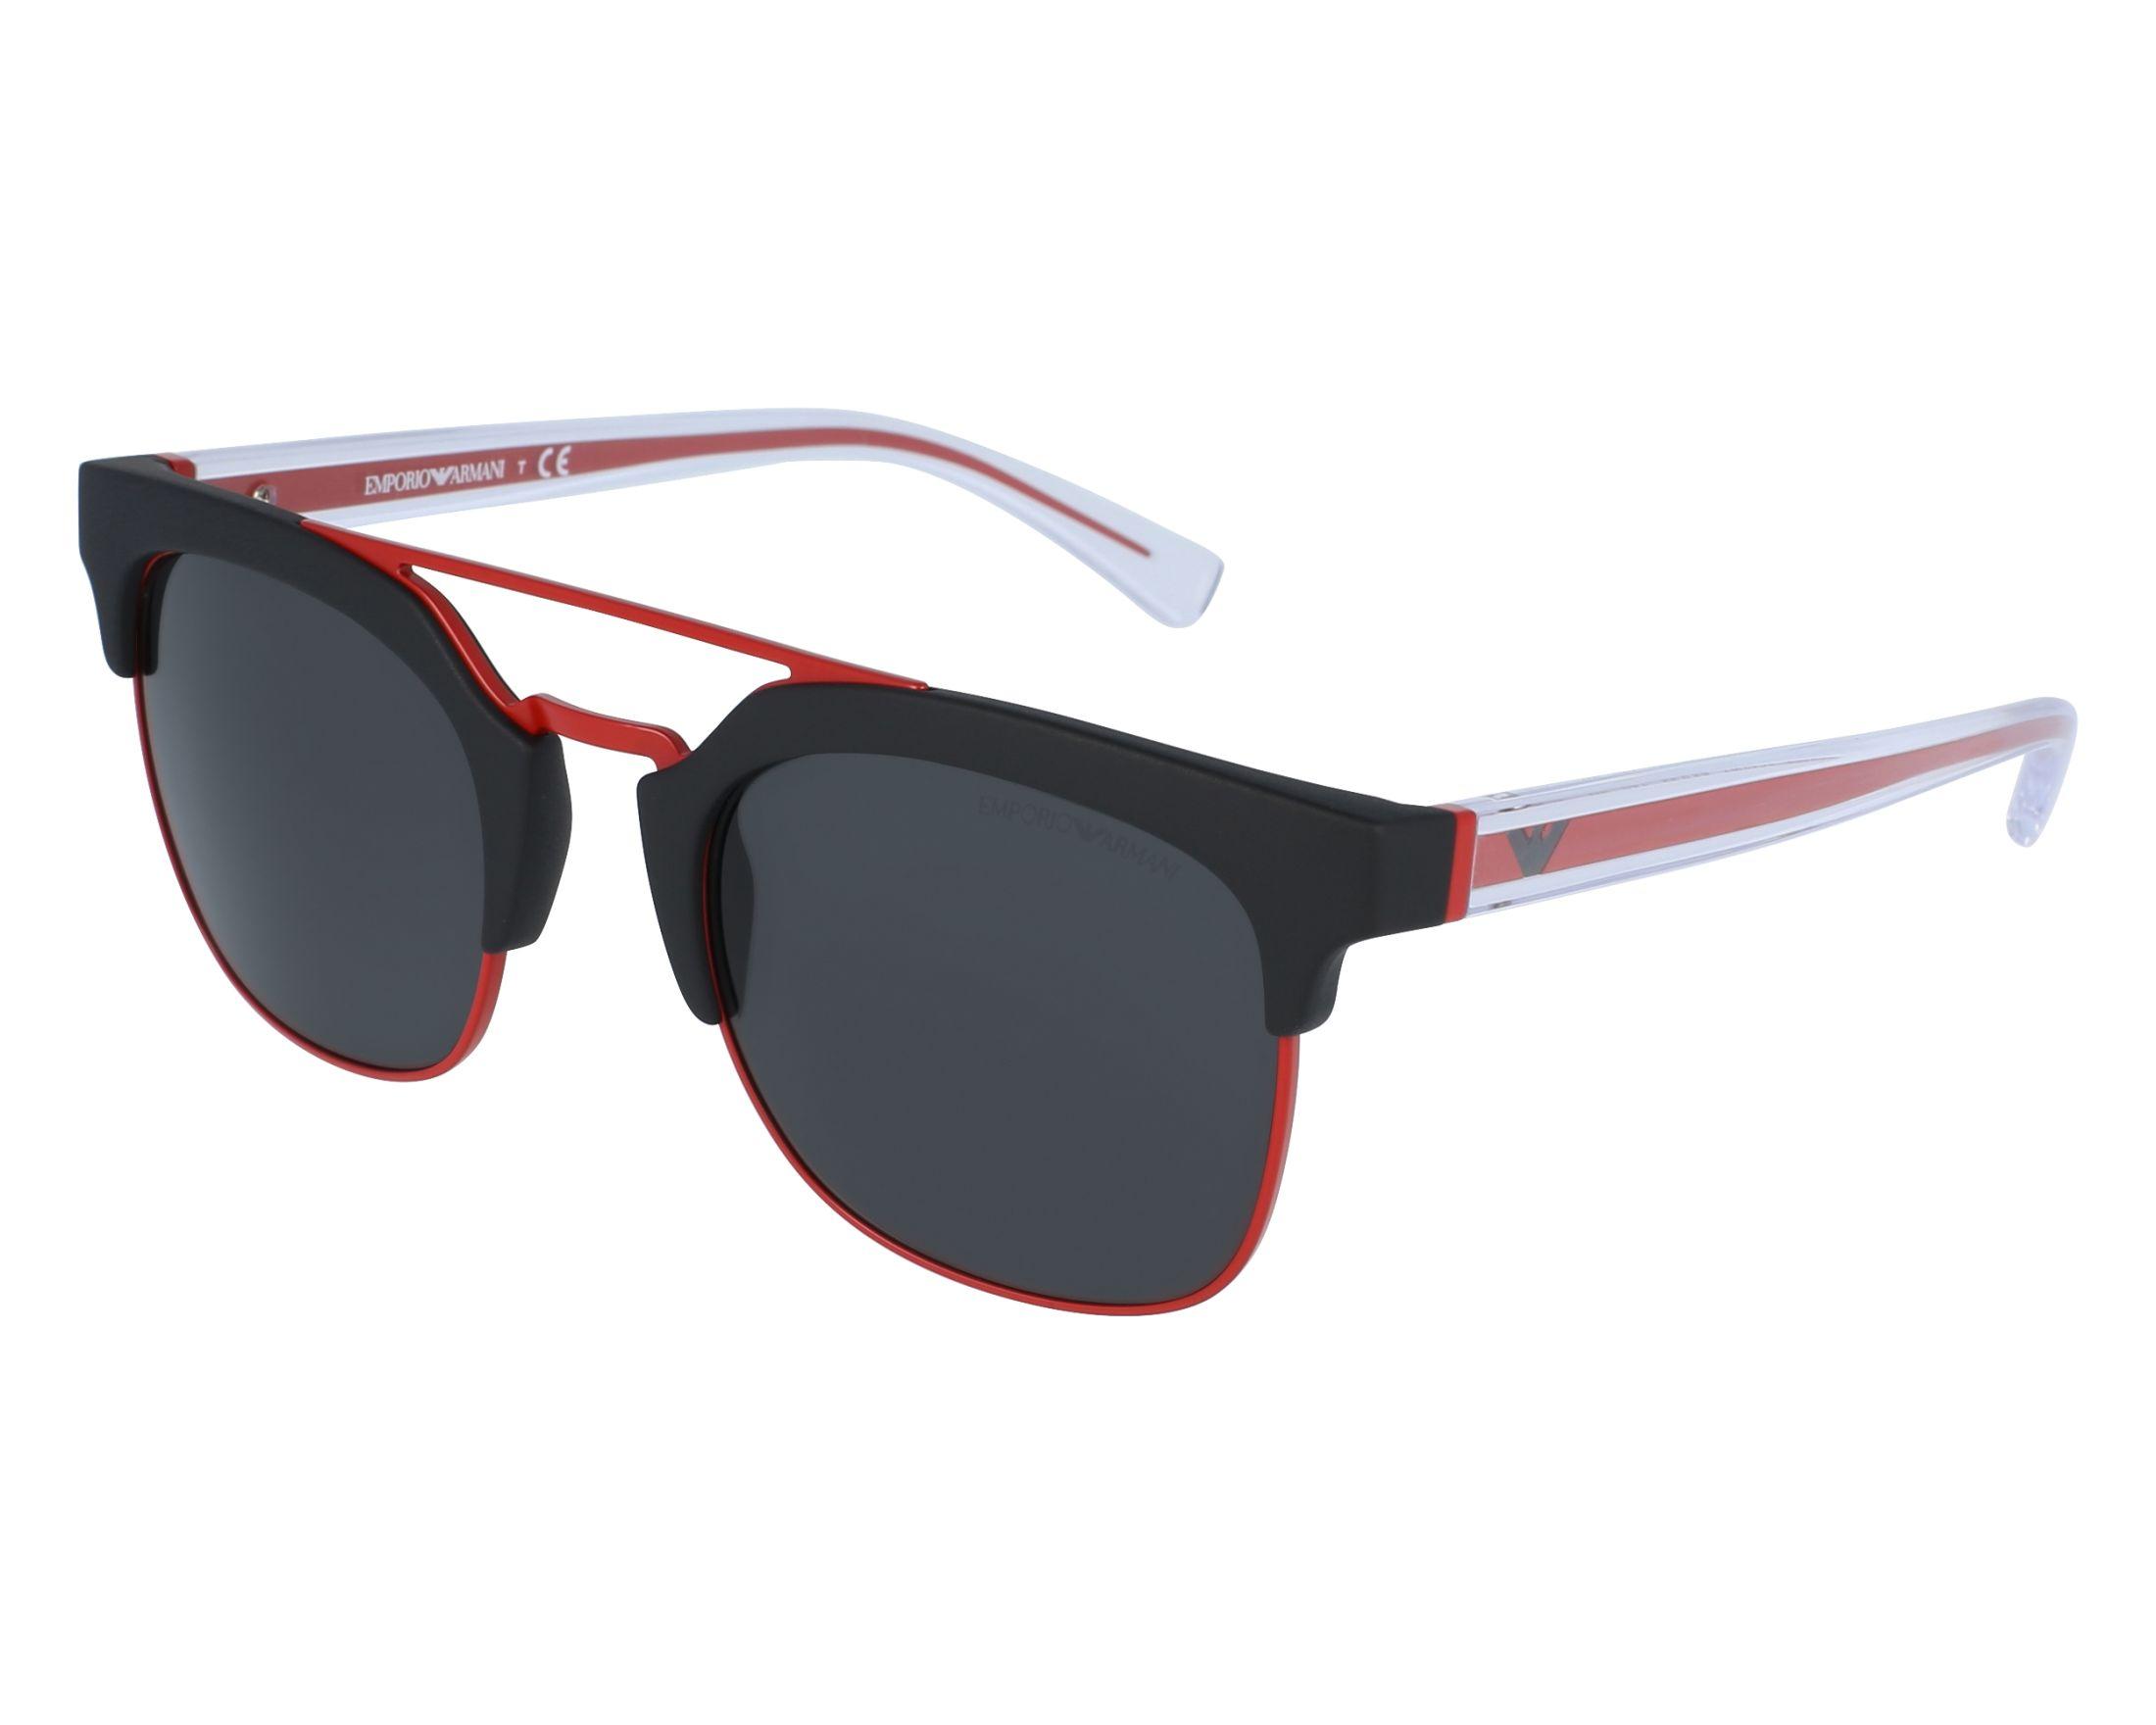 Emporio Armani EA4093 5042/87 Sonnenbrille GDjS0kG8Ss